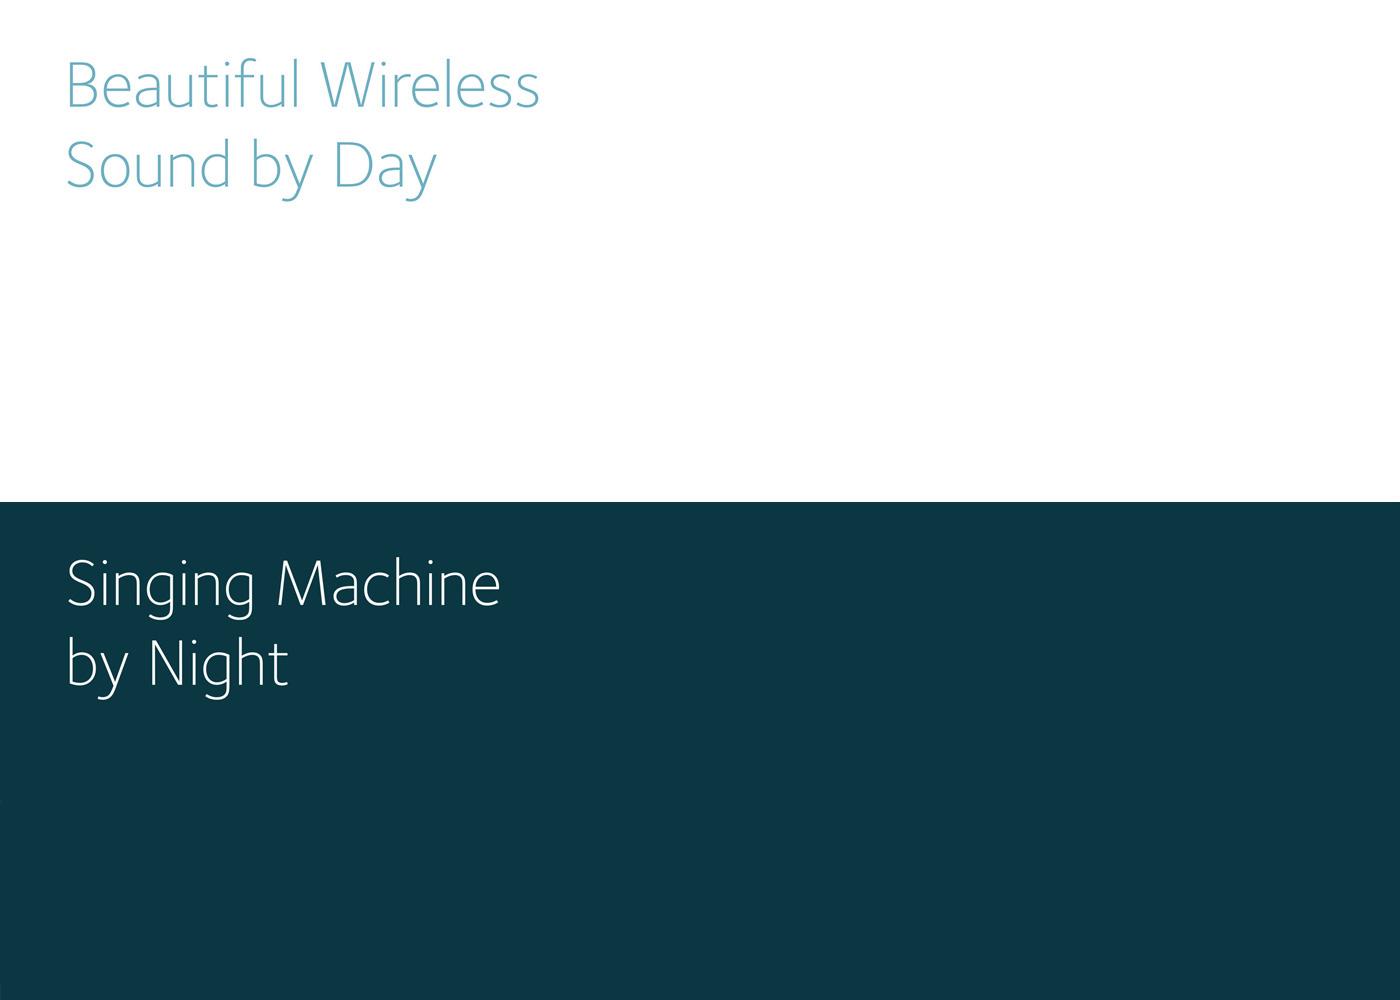 Singing Machine karaoke speaker brand identity Logotype brand guidelines styleguide UI Website Design TV interface